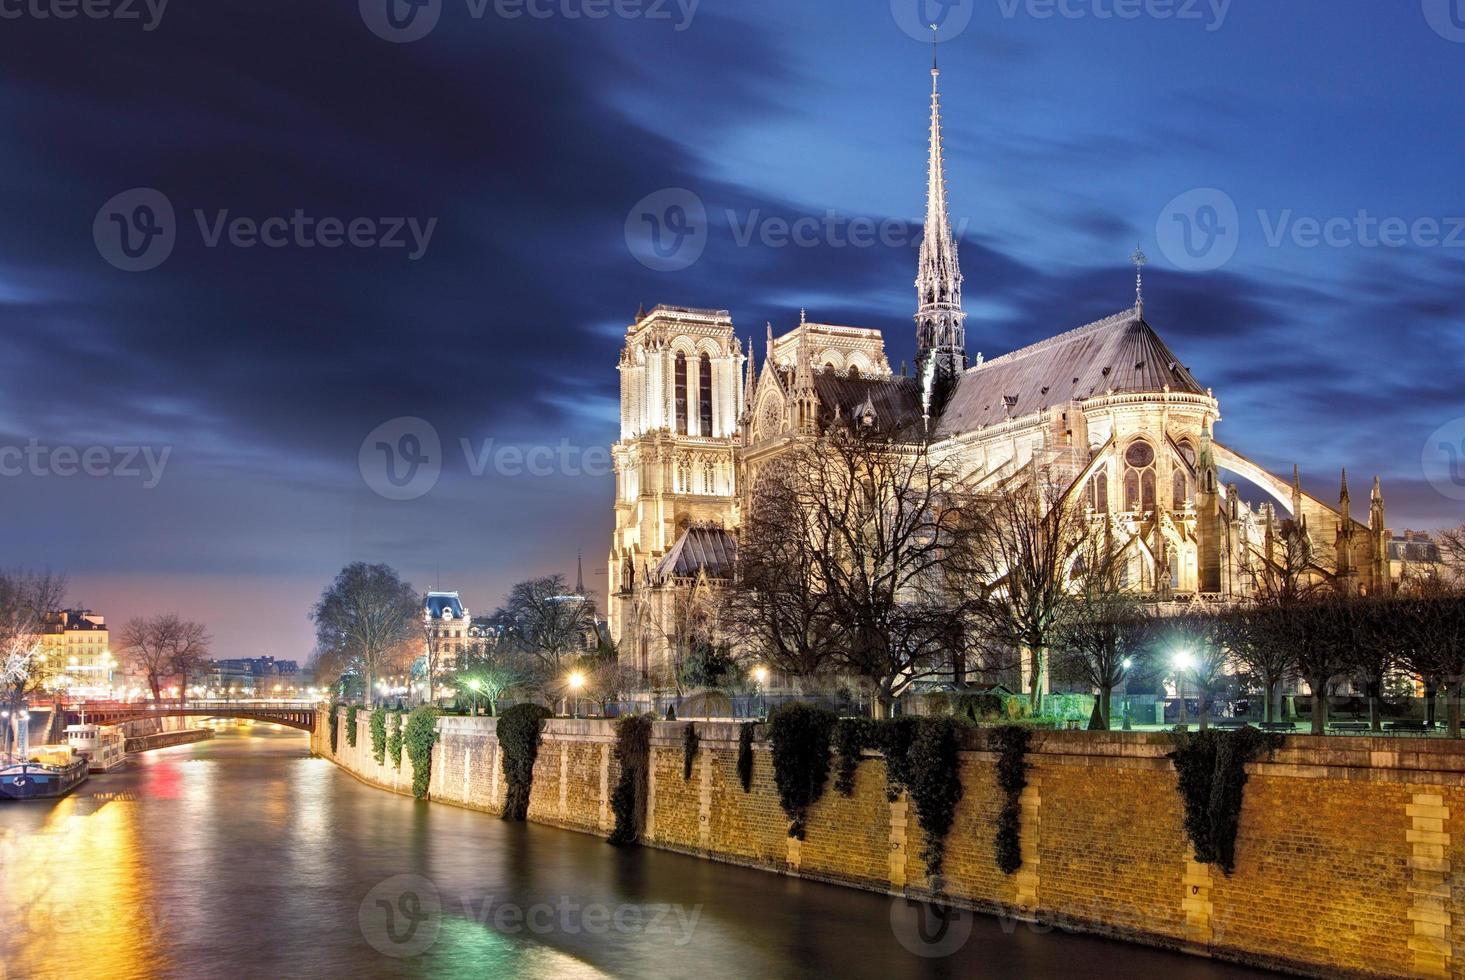 Notre Dame de Paris kathedraal en Seine rivier, Parijs, Frankrijk foto